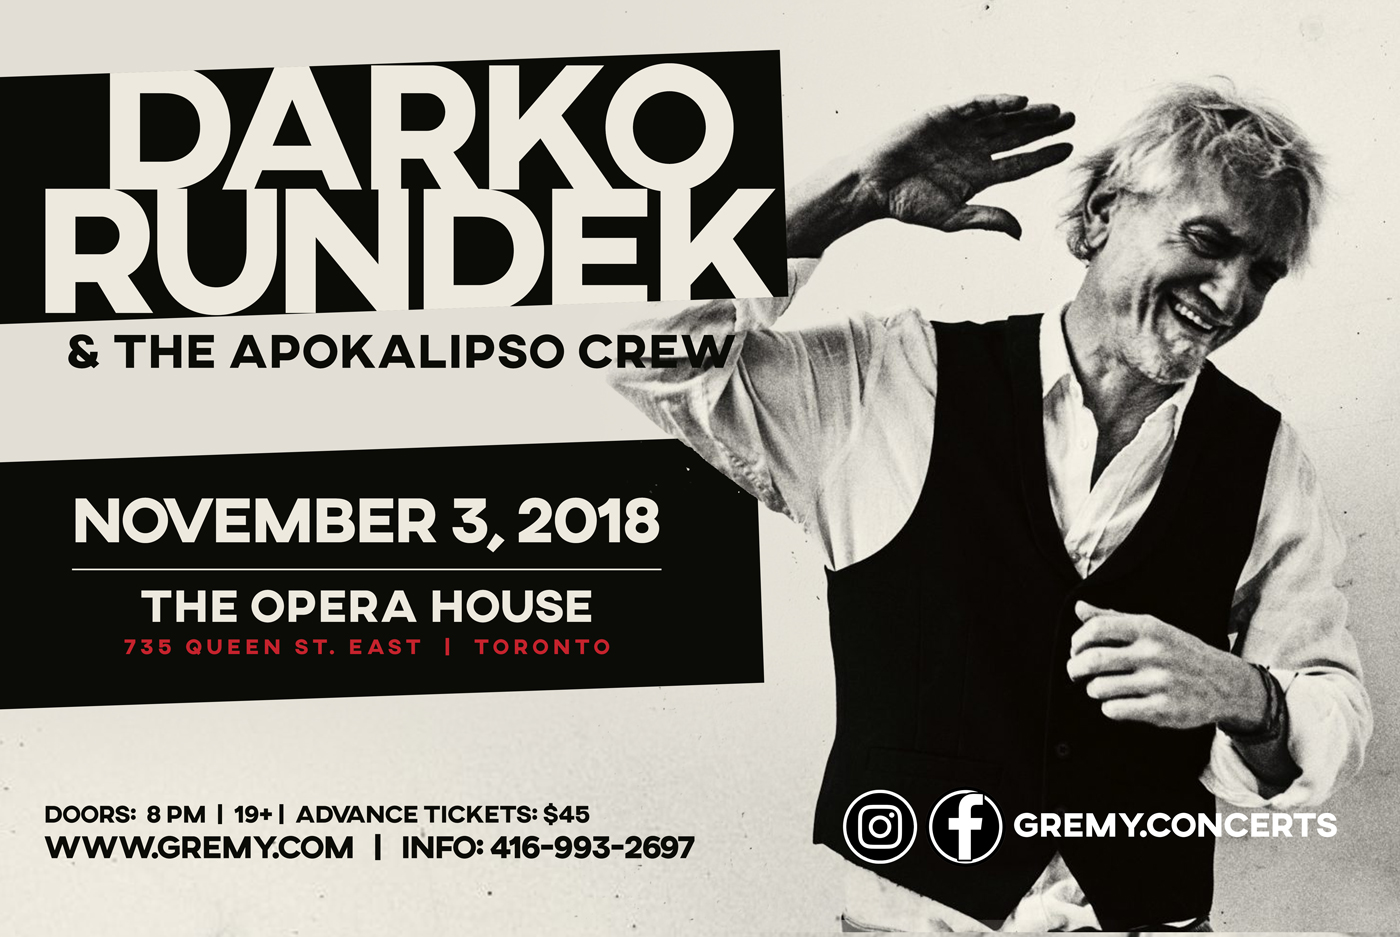 DARKO RUNDEK & Apokalipso Crew - Toronto 2018